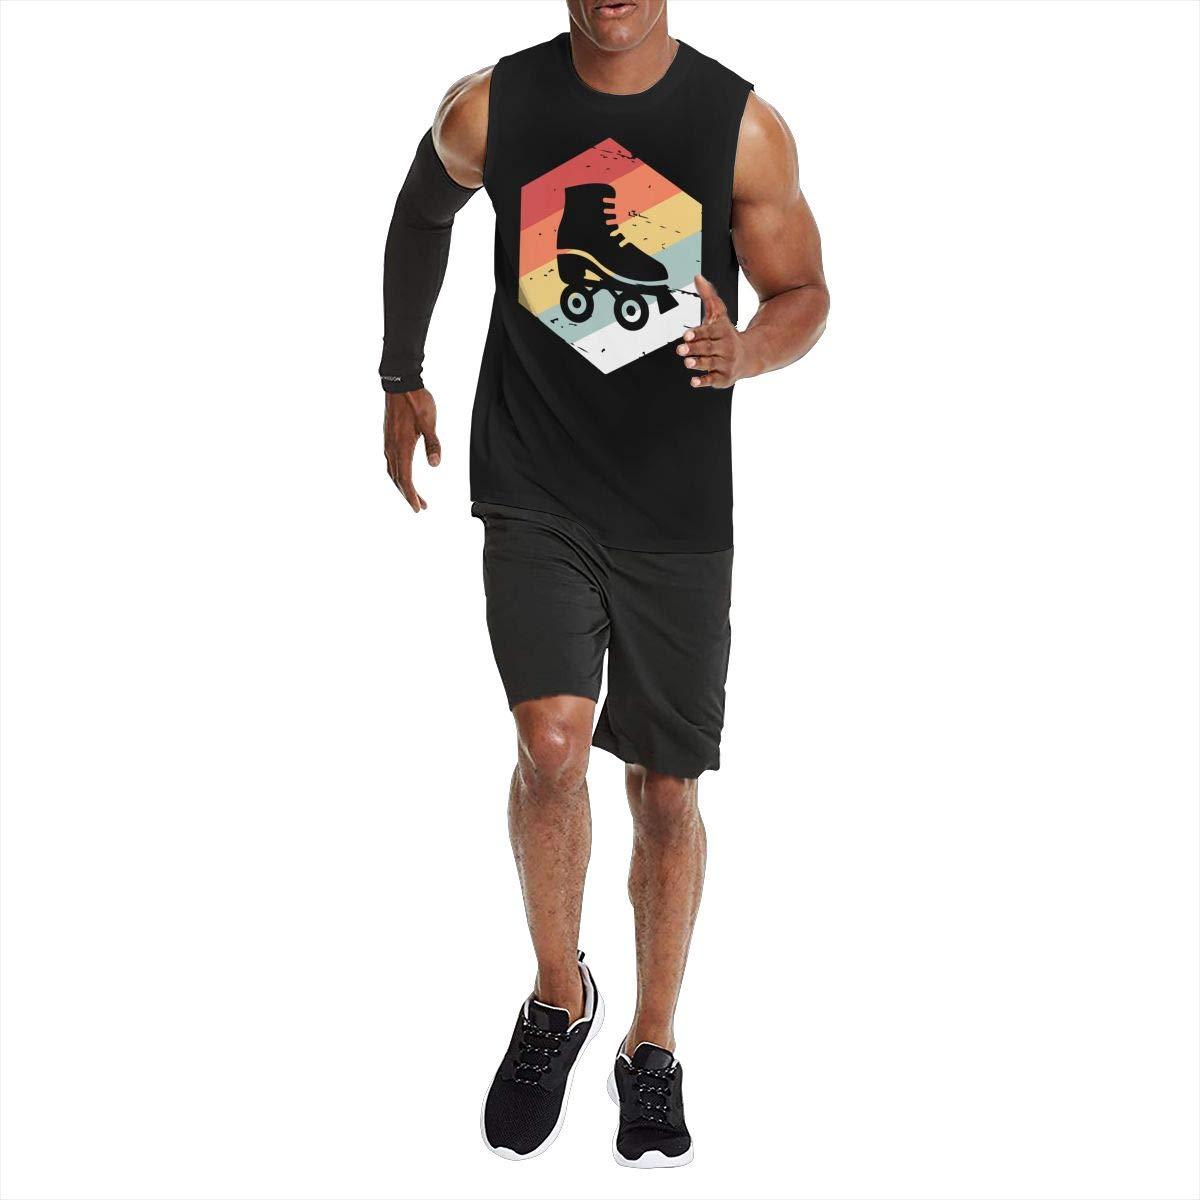 Vintage 70s Style Roller Skating Mens Compression Jersey Tank Undershirts